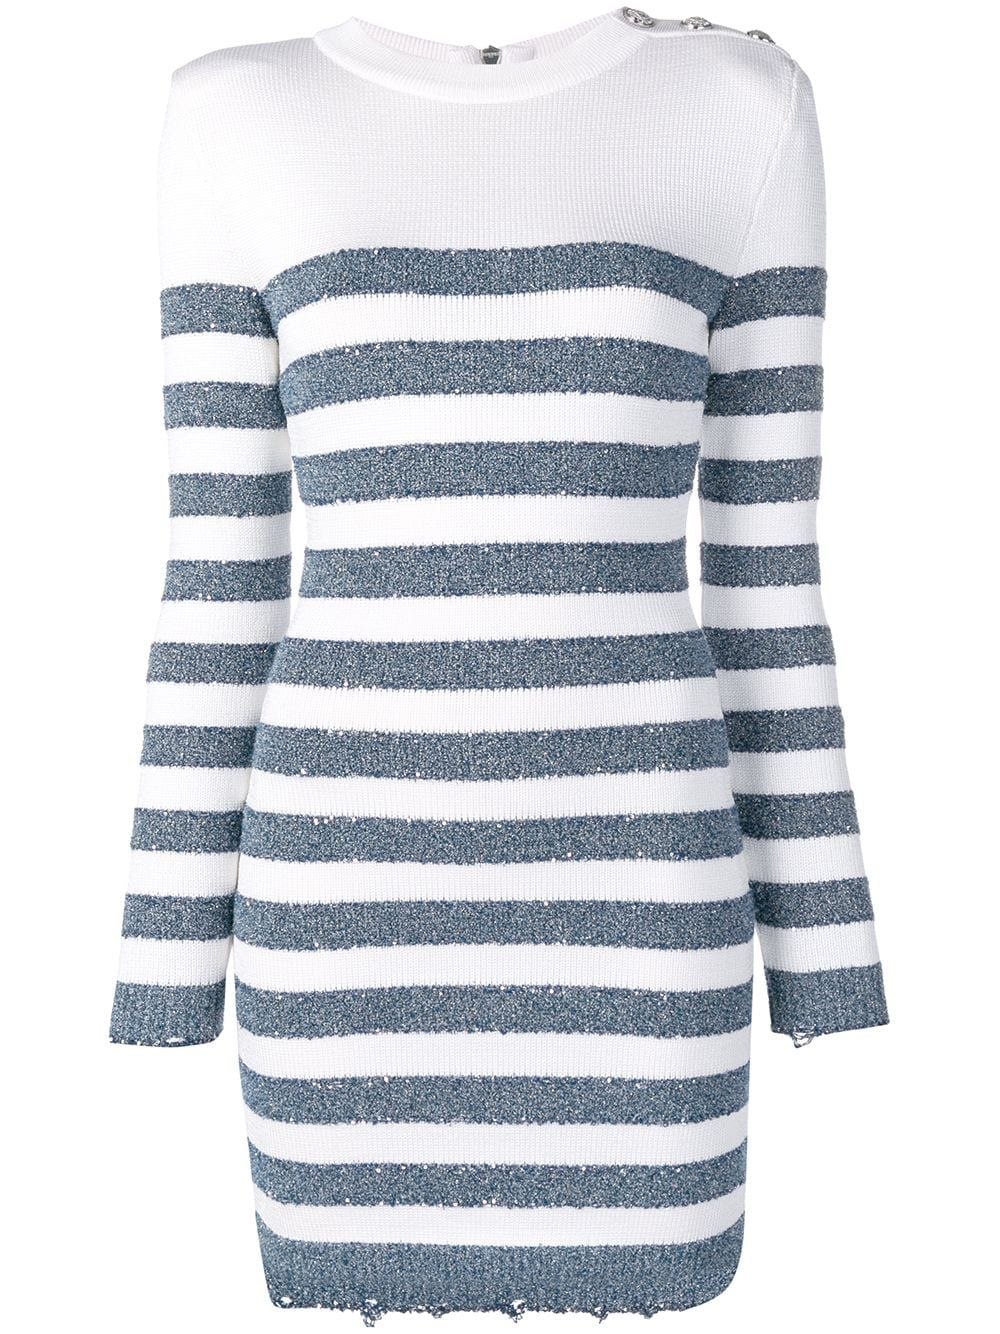 Balmain Horizontal Stripes Knitted Dress Farfetch Striped Knit Dress Striped Knit Horizontal Striped Dress [ 1334 x 1000 Pixel ]